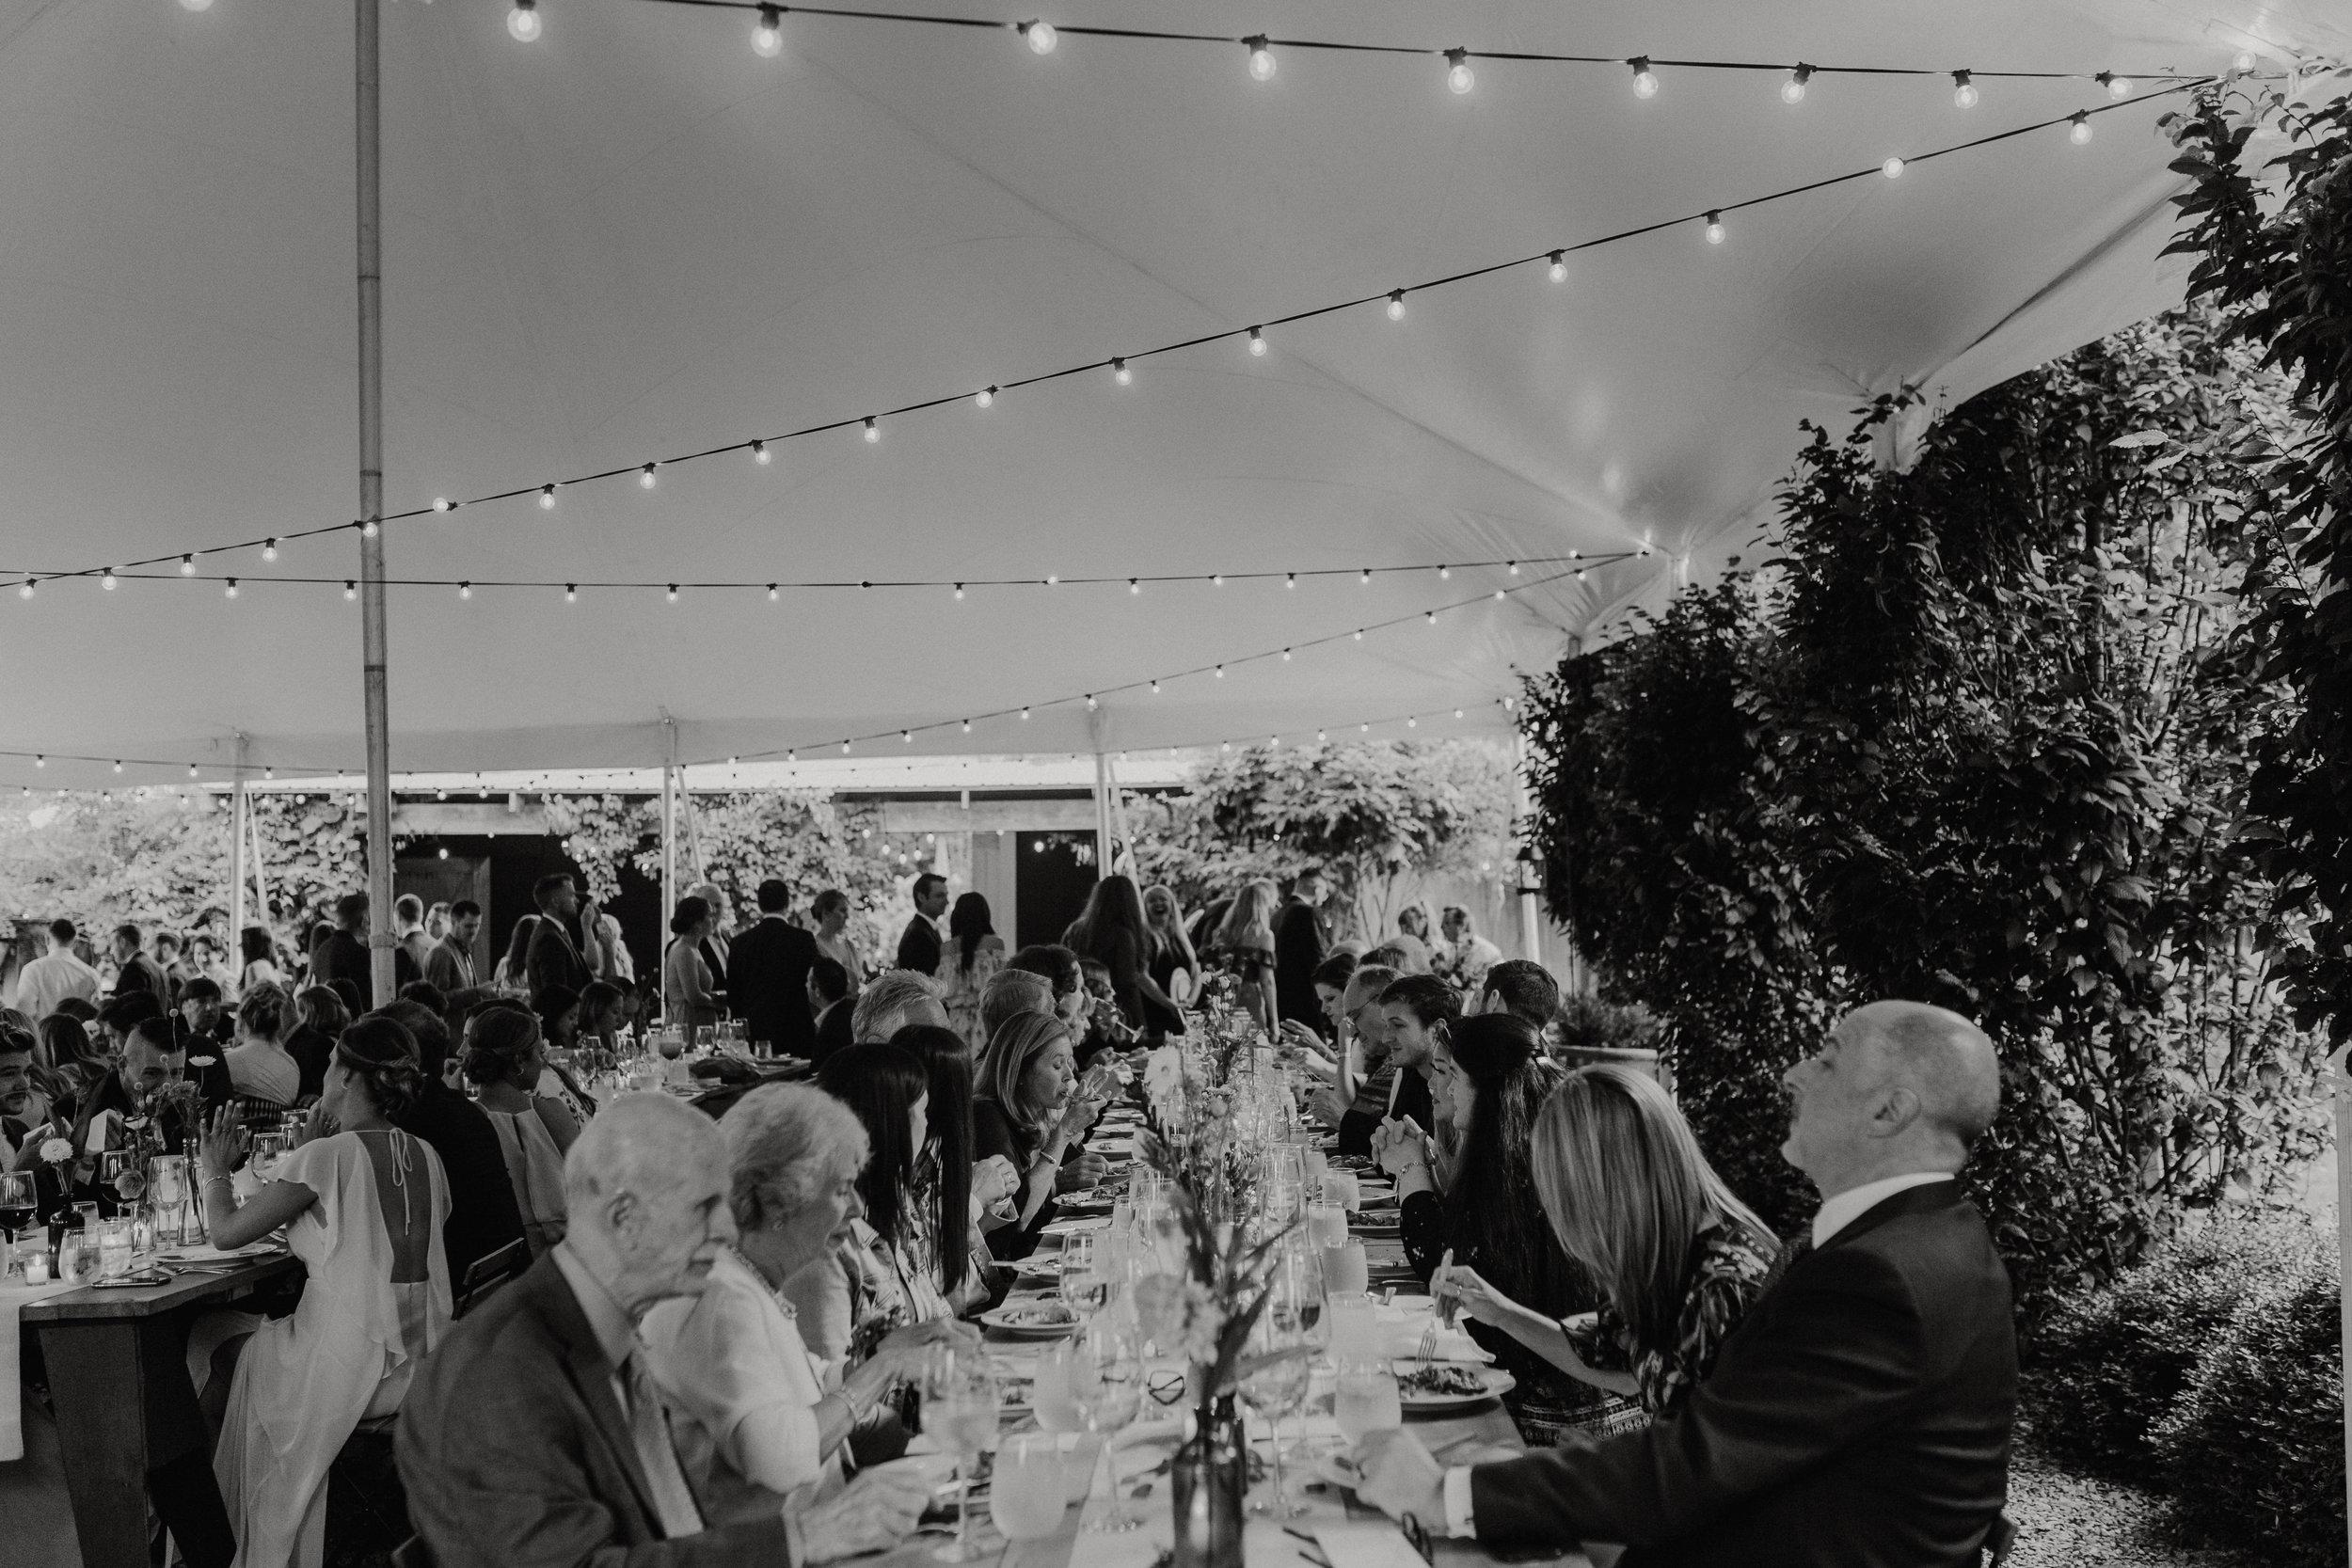 m-and-d-farm-wedding-107.jpg